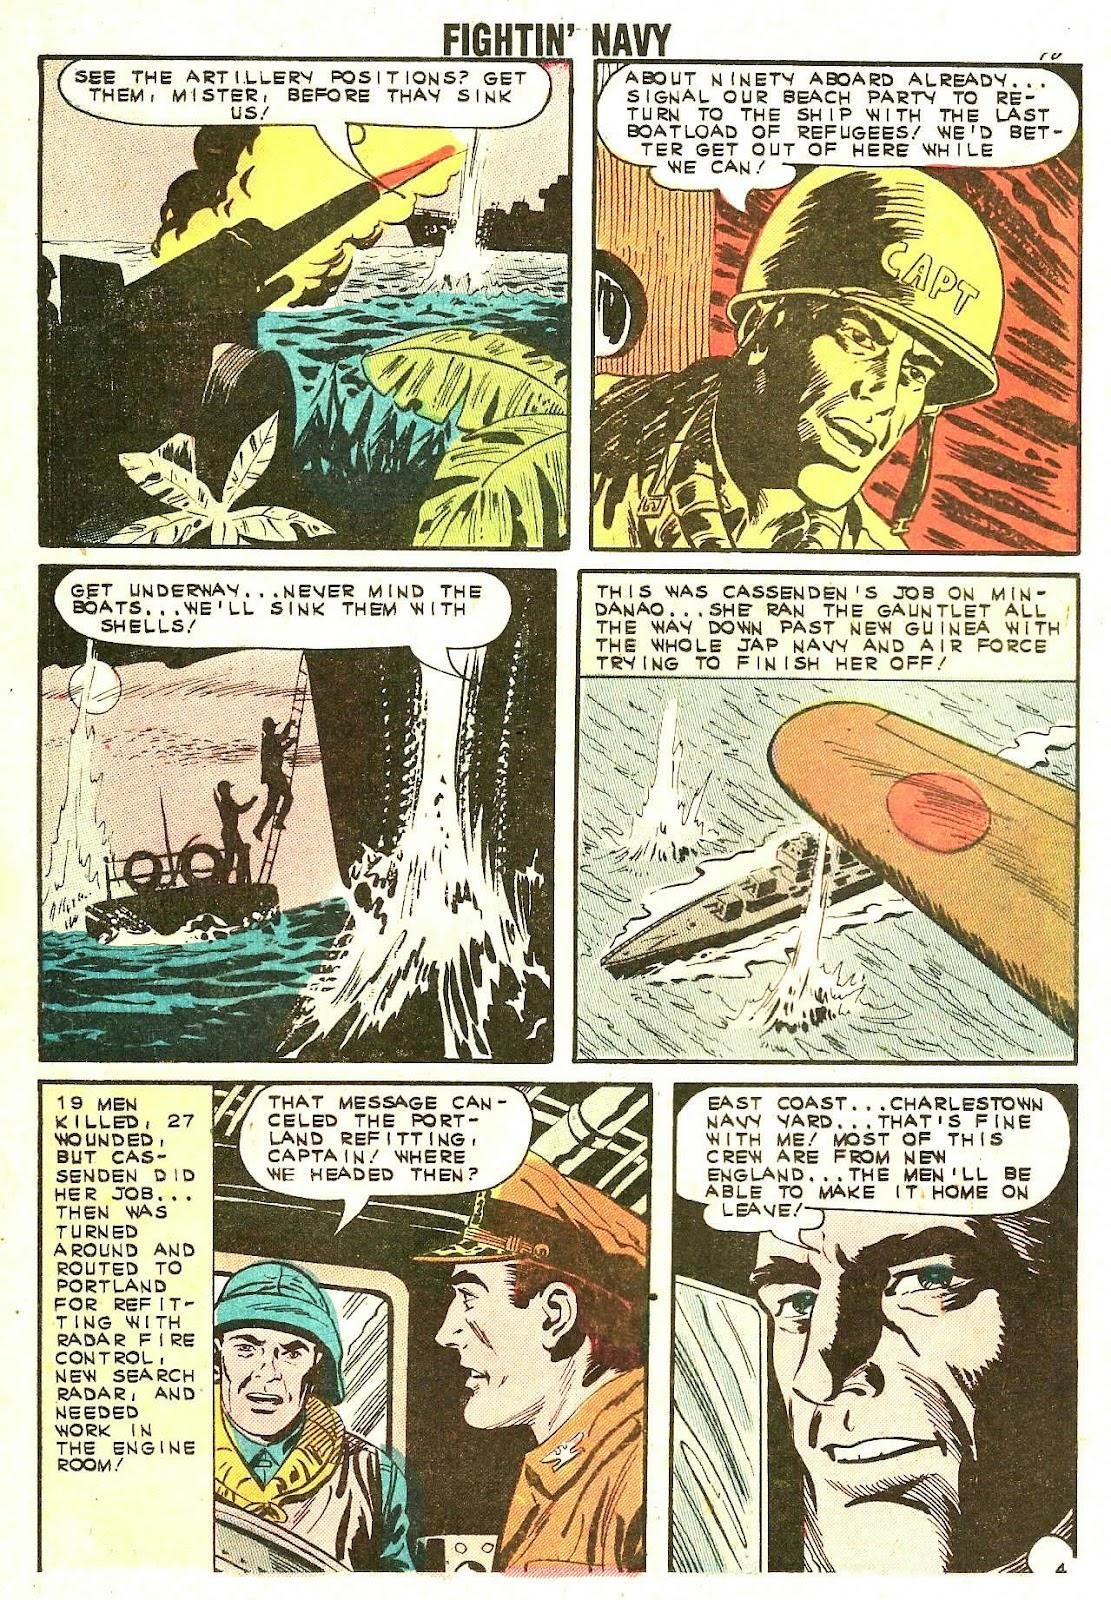 Read online Fightin' Navy comic -  Issue #110 - 12